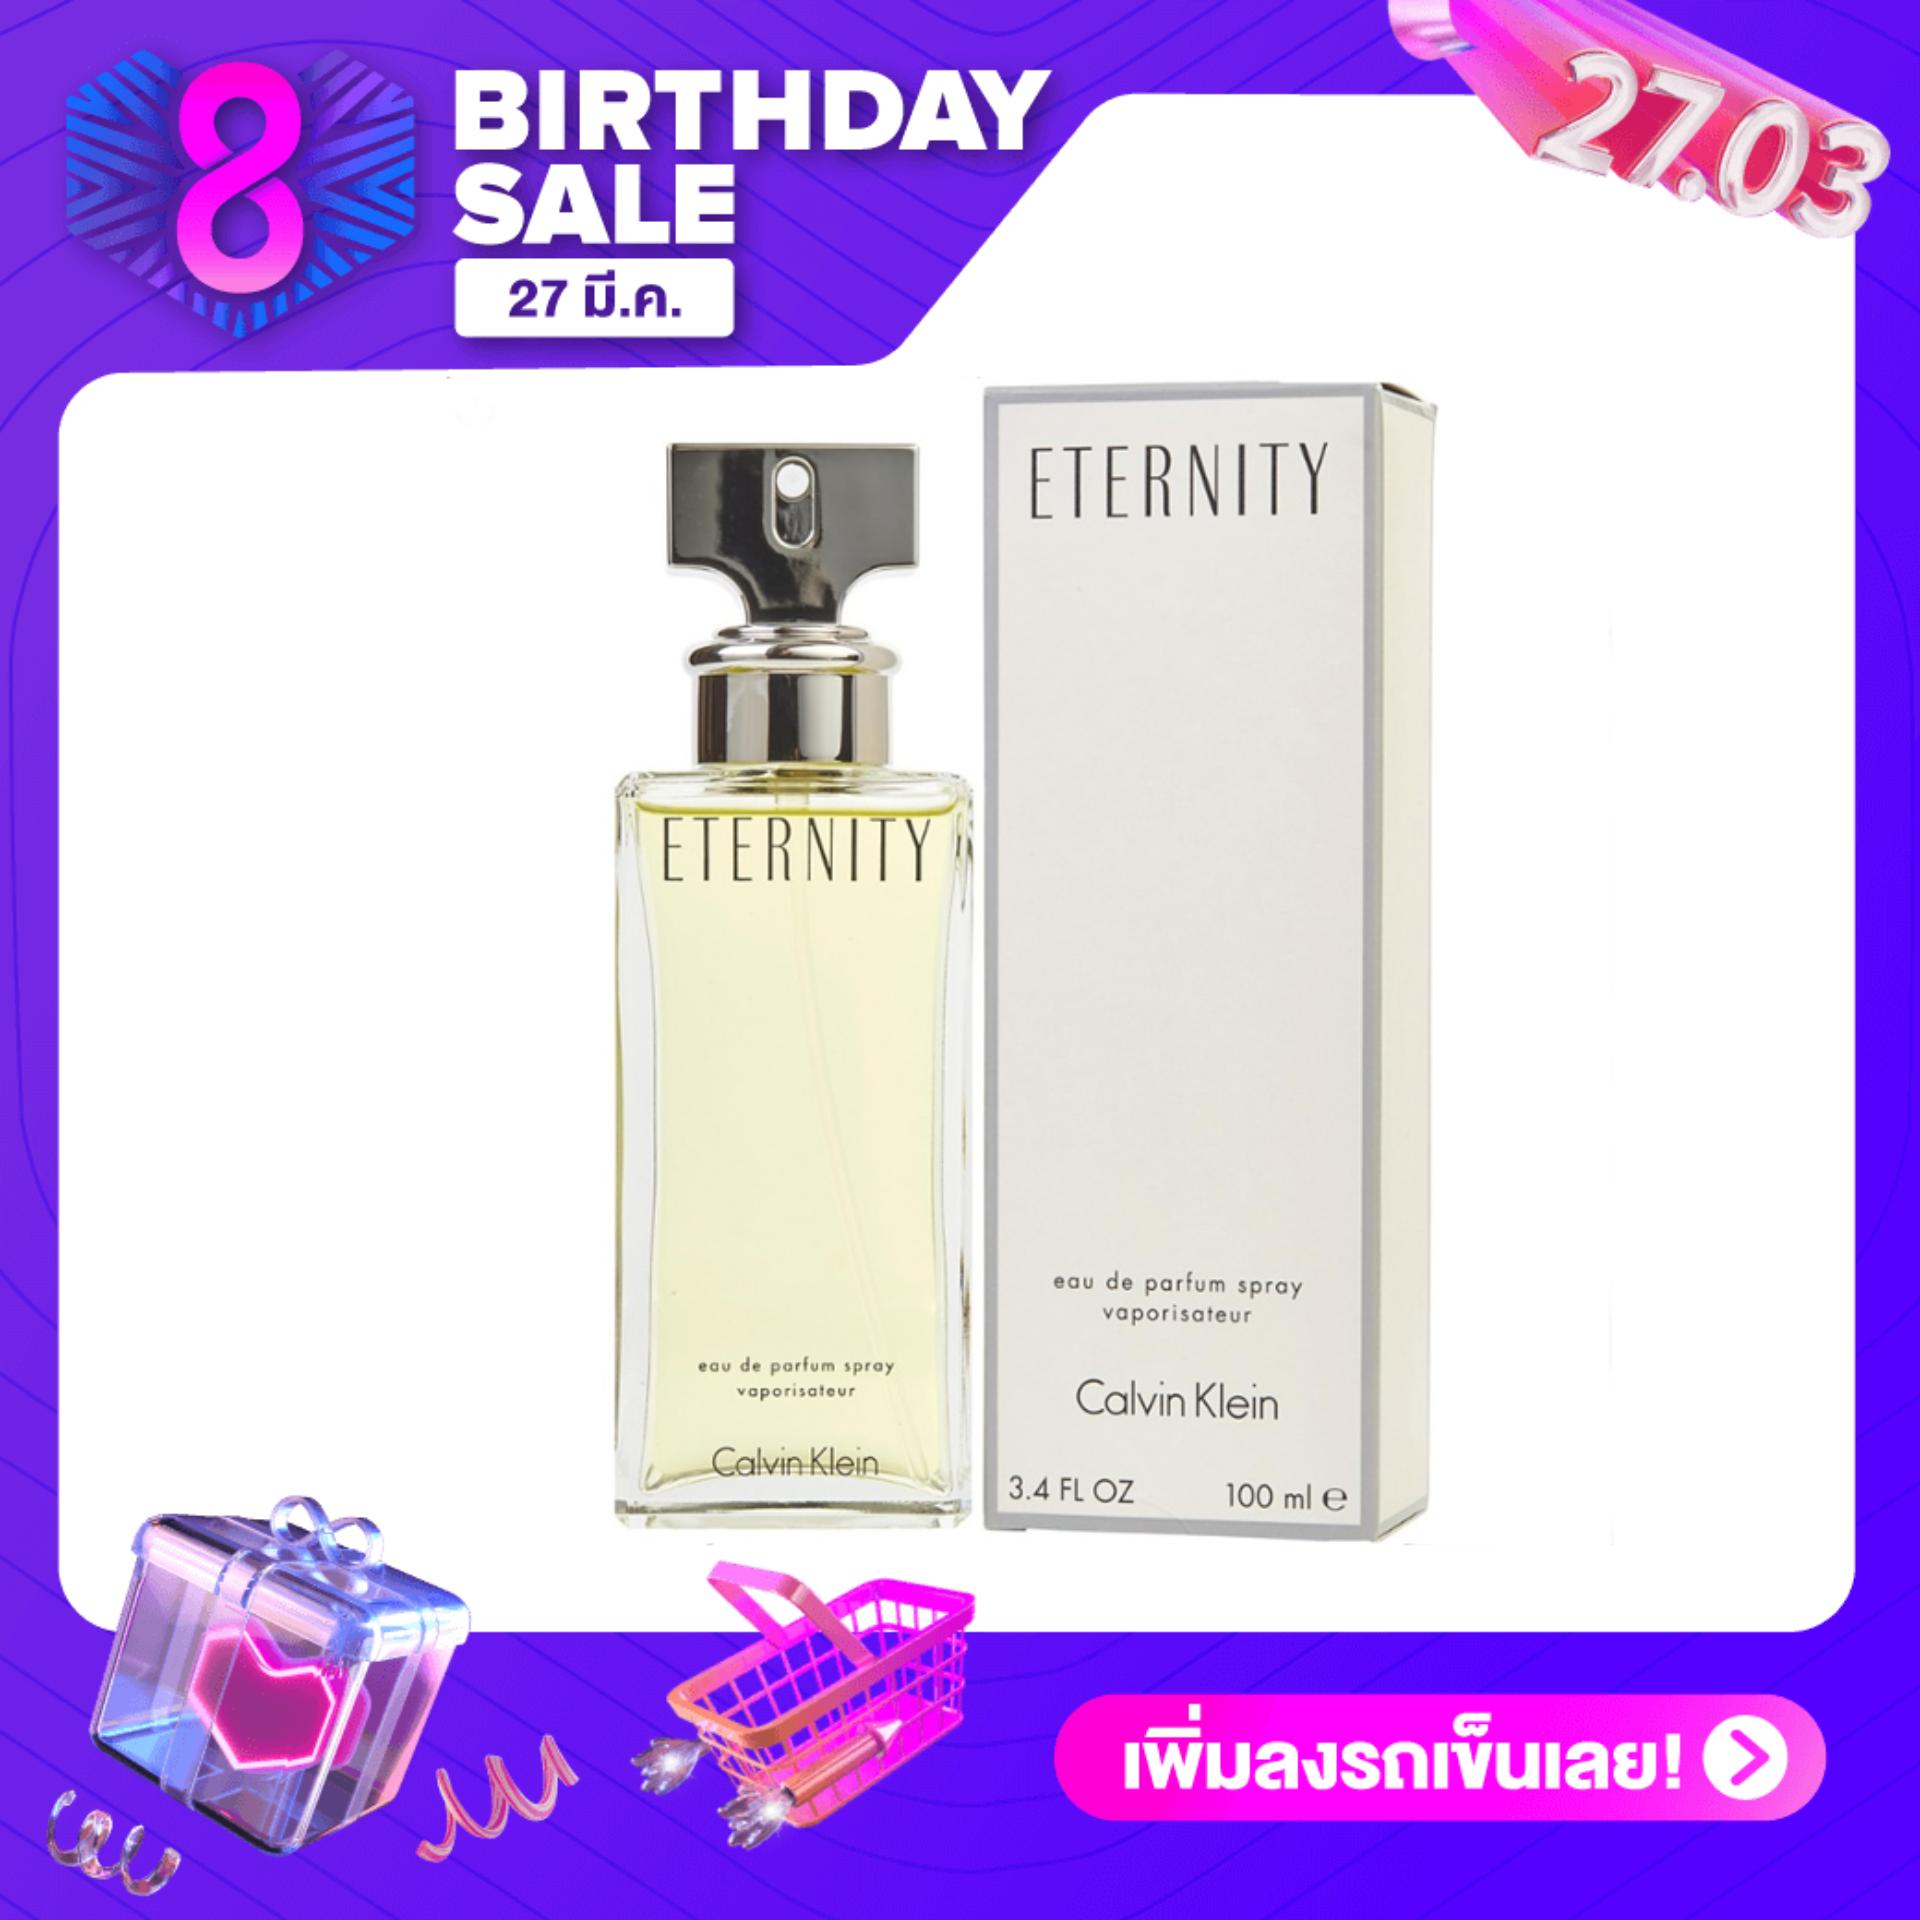 Calvin Klein Eternity for Women EDP 100 ml.พร้อมกล่อง